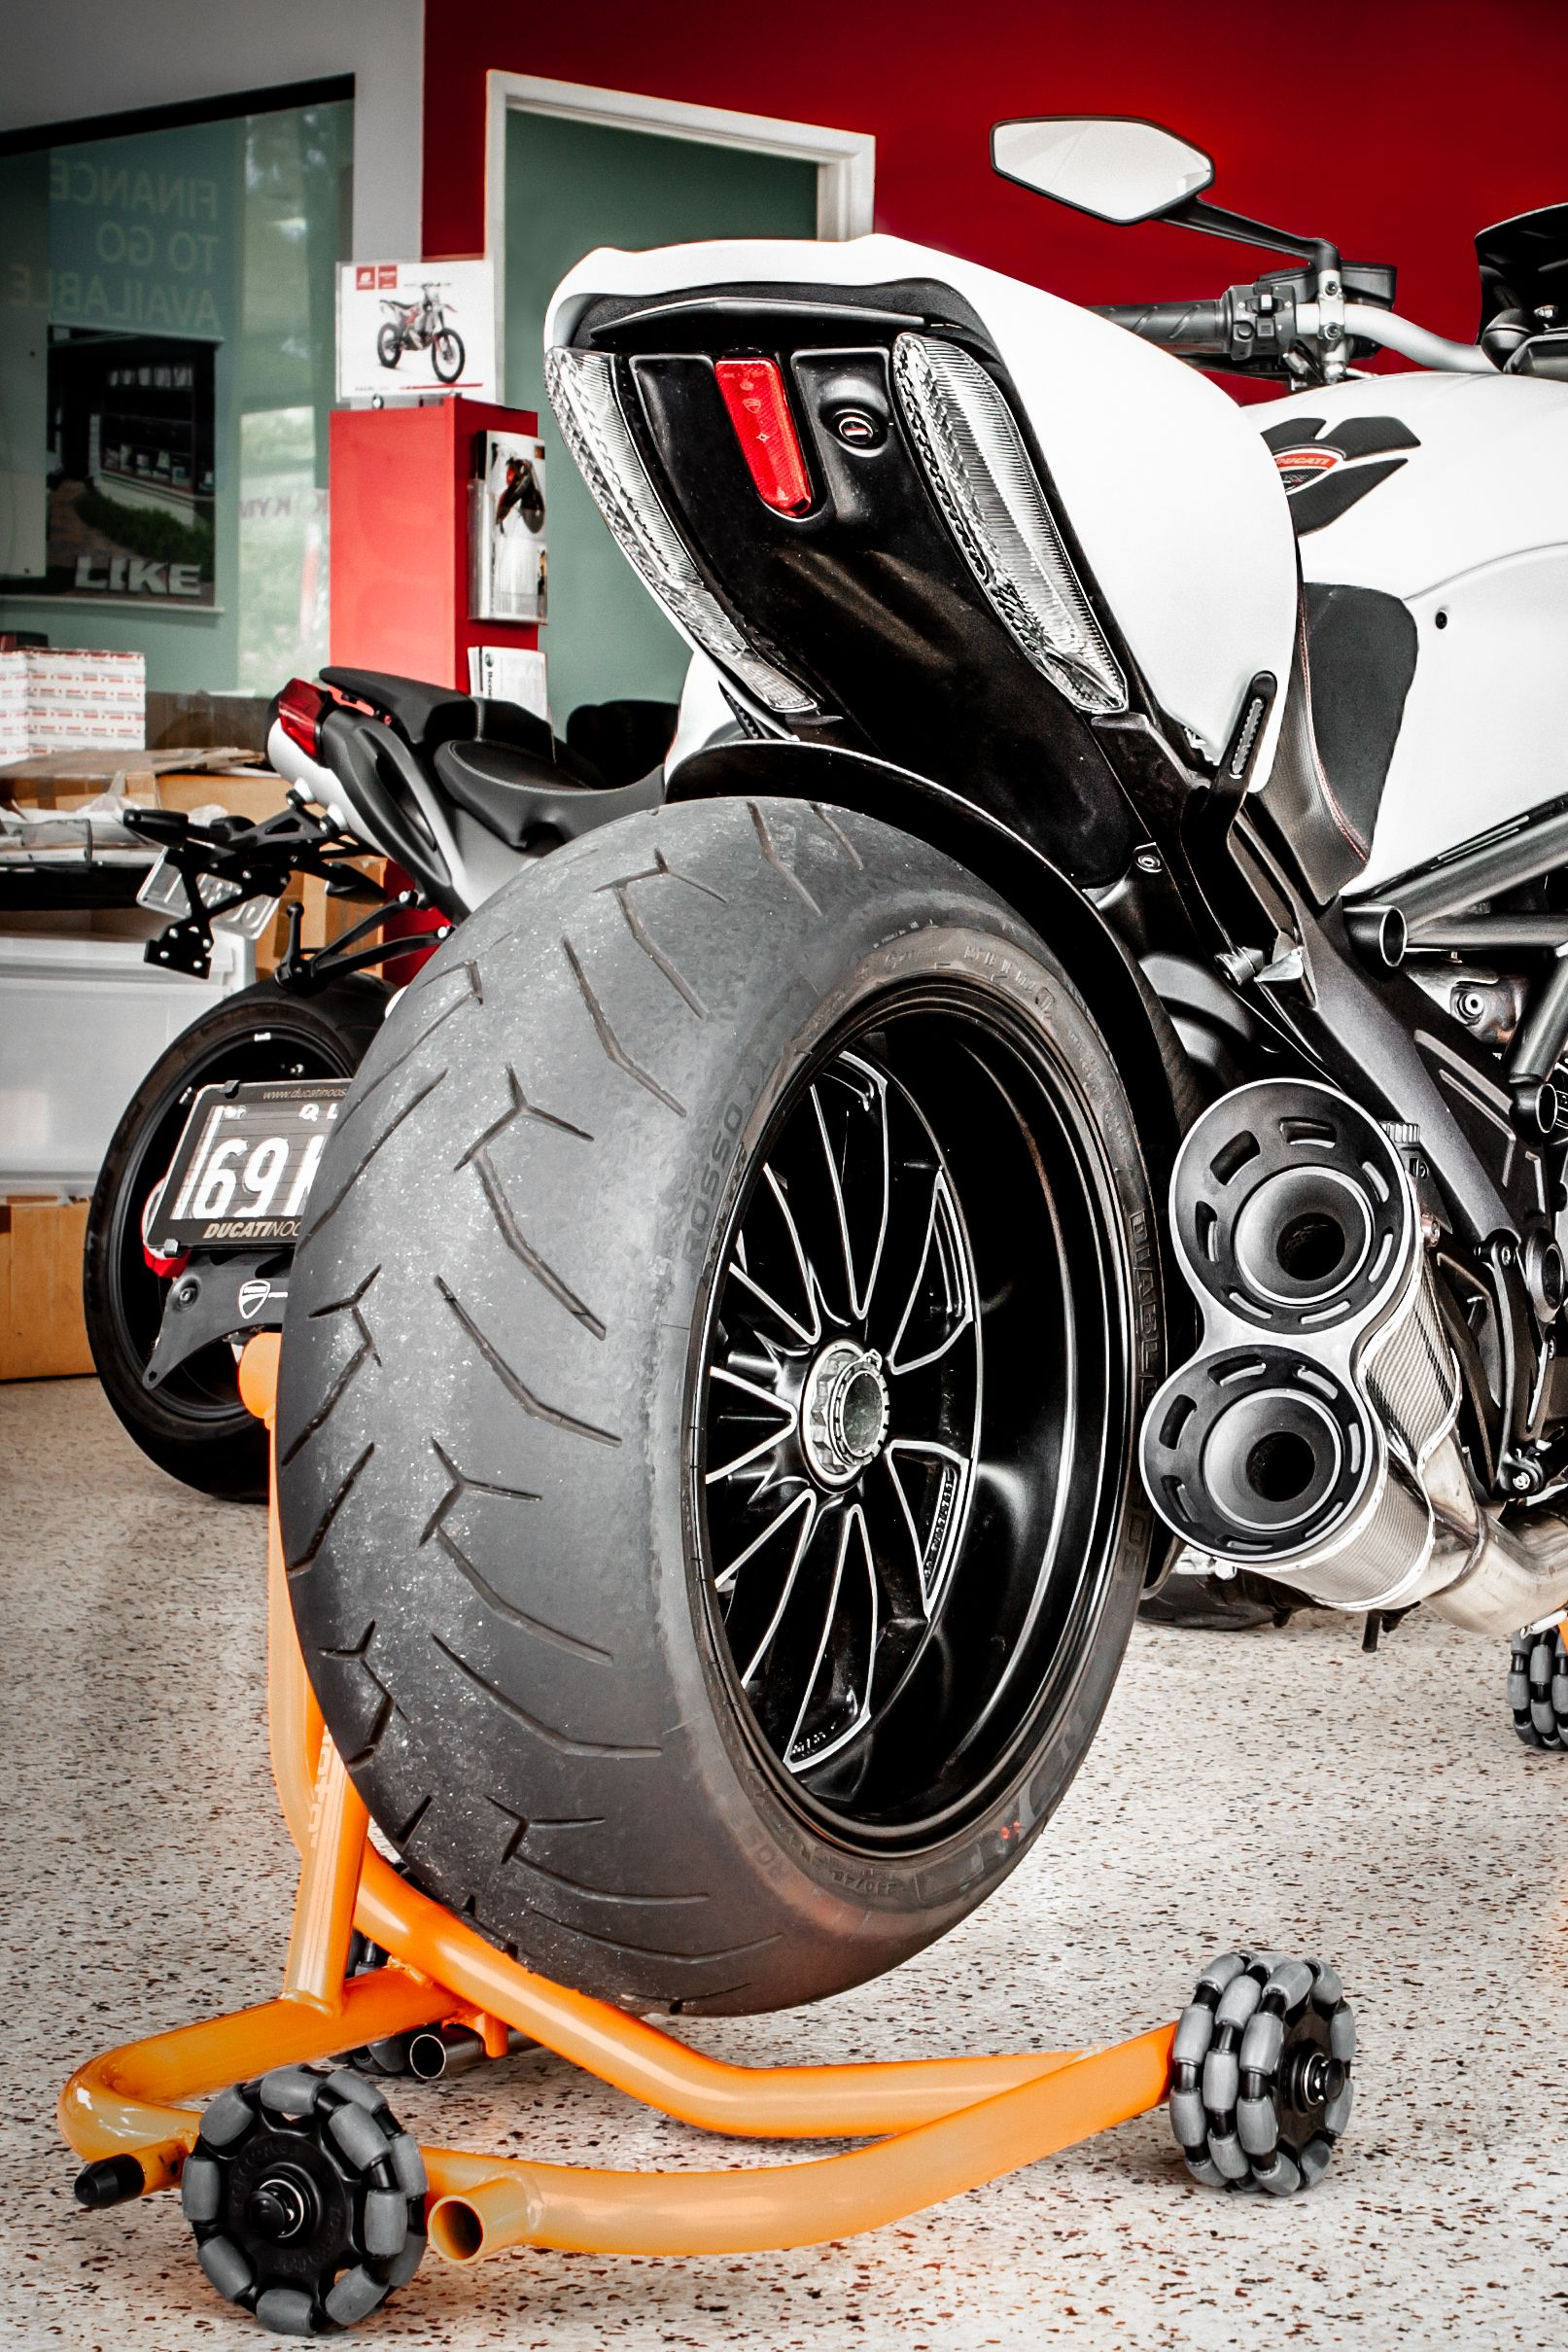 Ducati 916 Fuse Box Everything About Wiring Diagram 848 Schematics Rh Ksefanzone Com 748